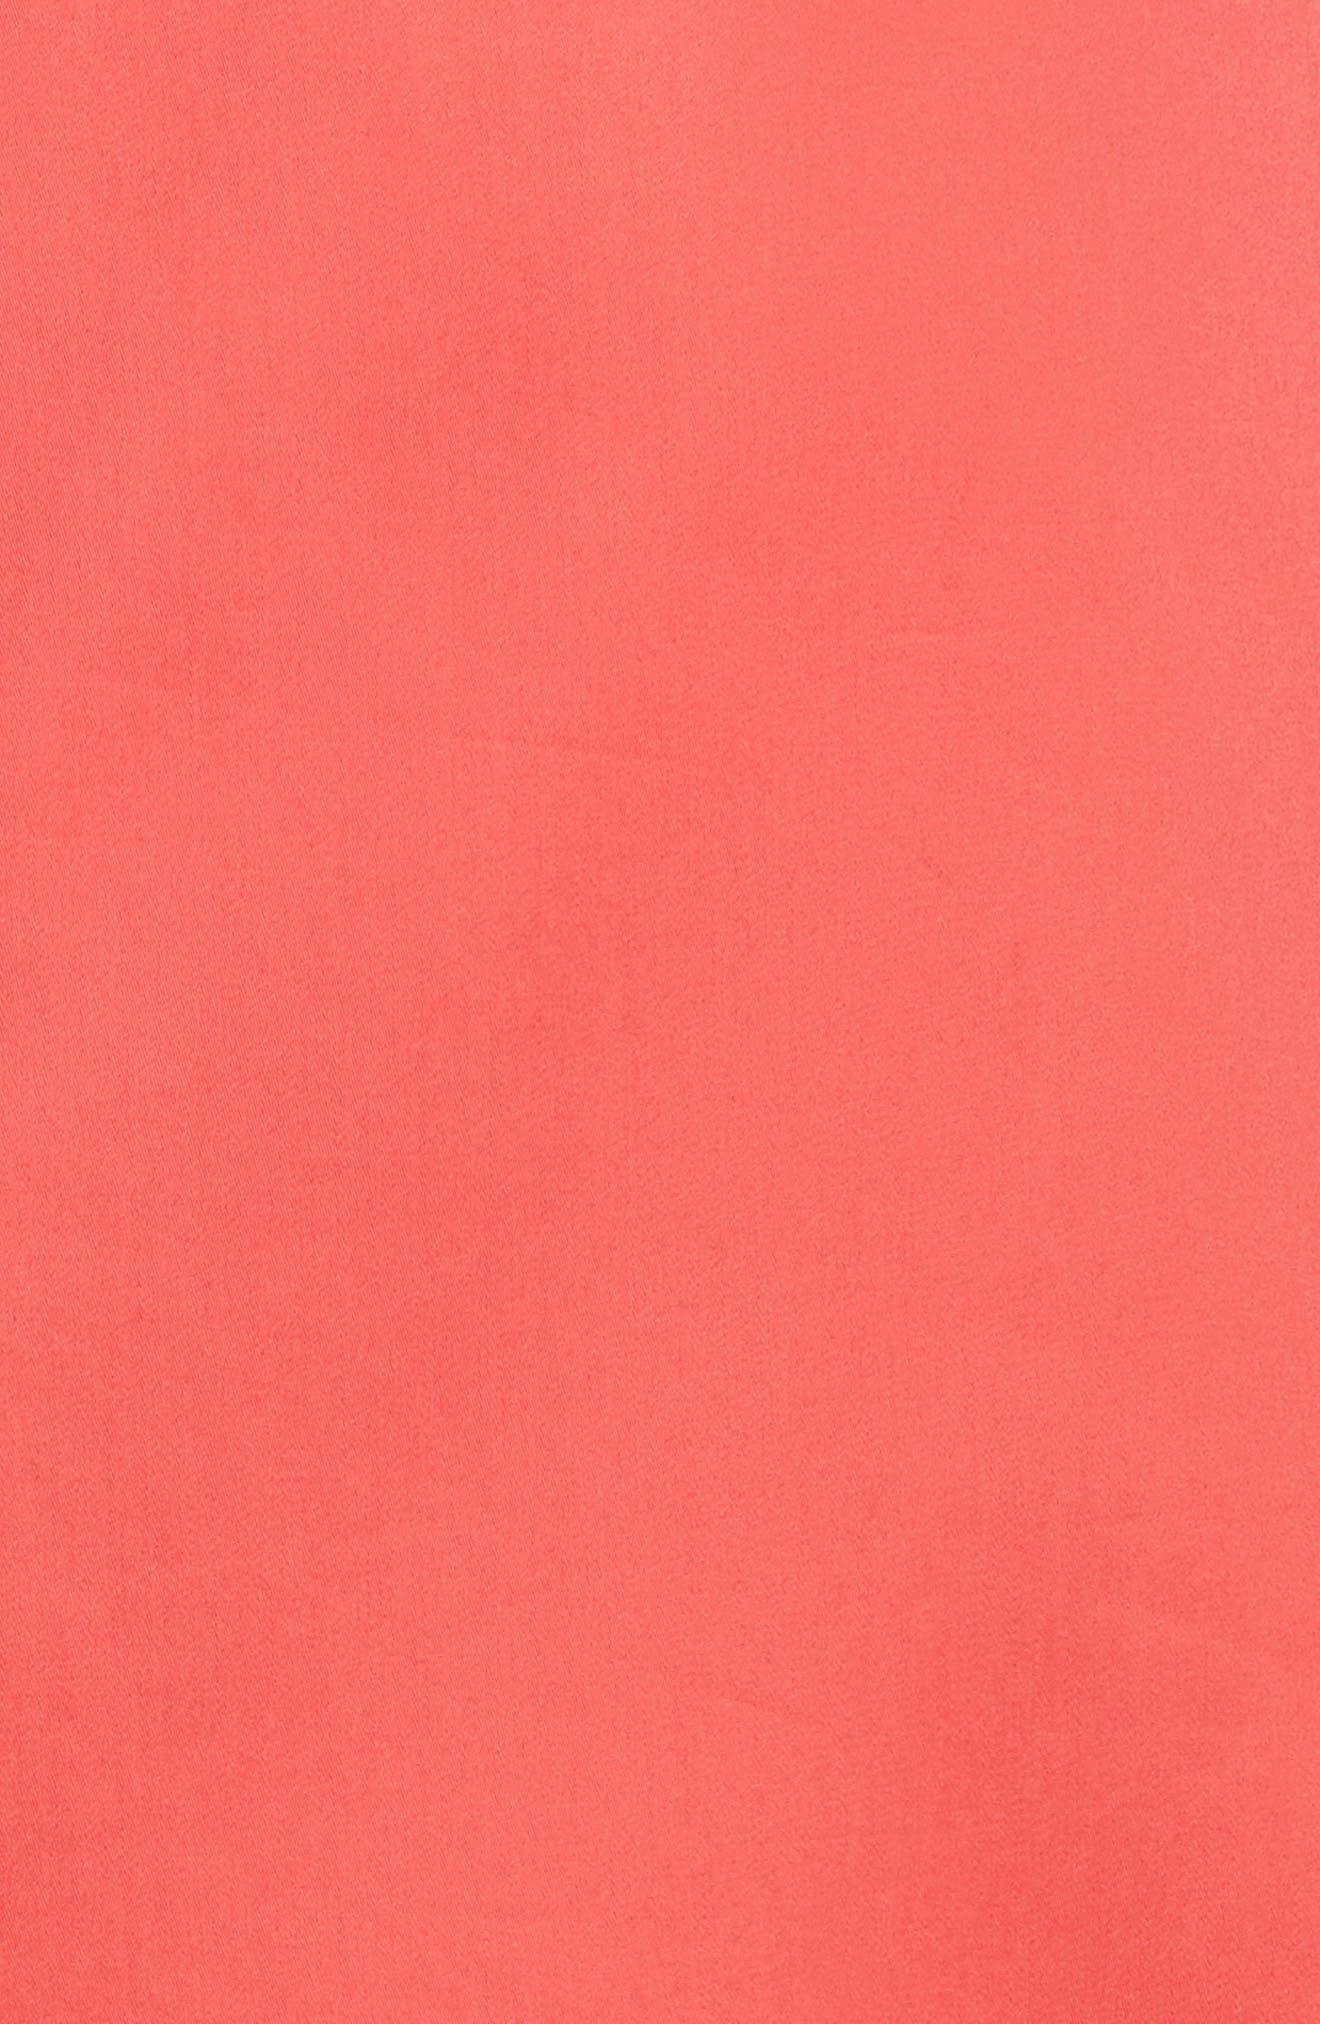 Prose & Poetry Tyra Midi Skirt,                             Alternate thumbnail 5, color,                             Watermelon